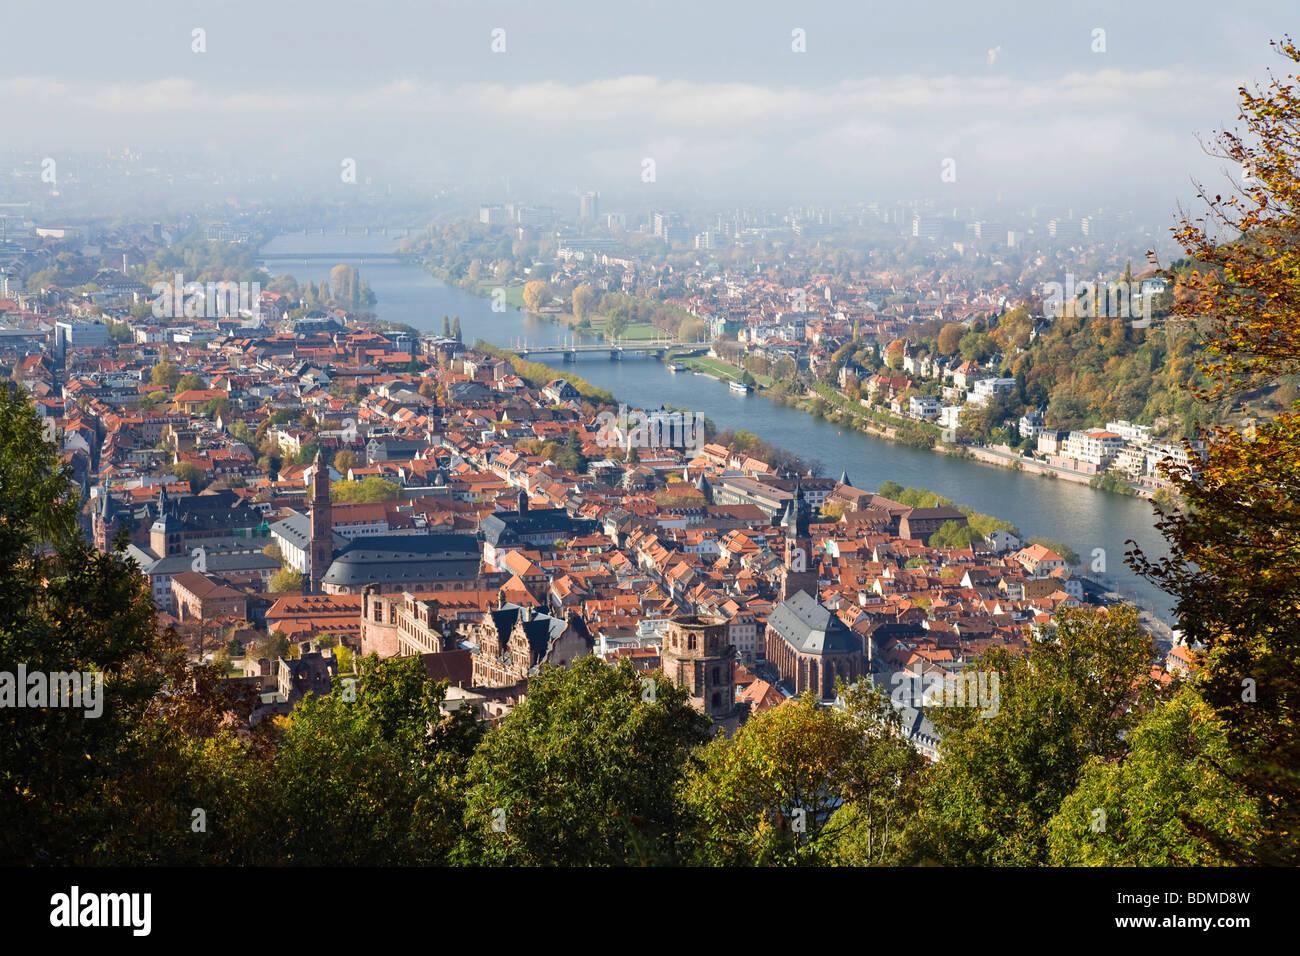 Historic centre of Heidelberg at Neckar River from above, Baden-Wuerttemberg, Germany, Europe Stock Photo